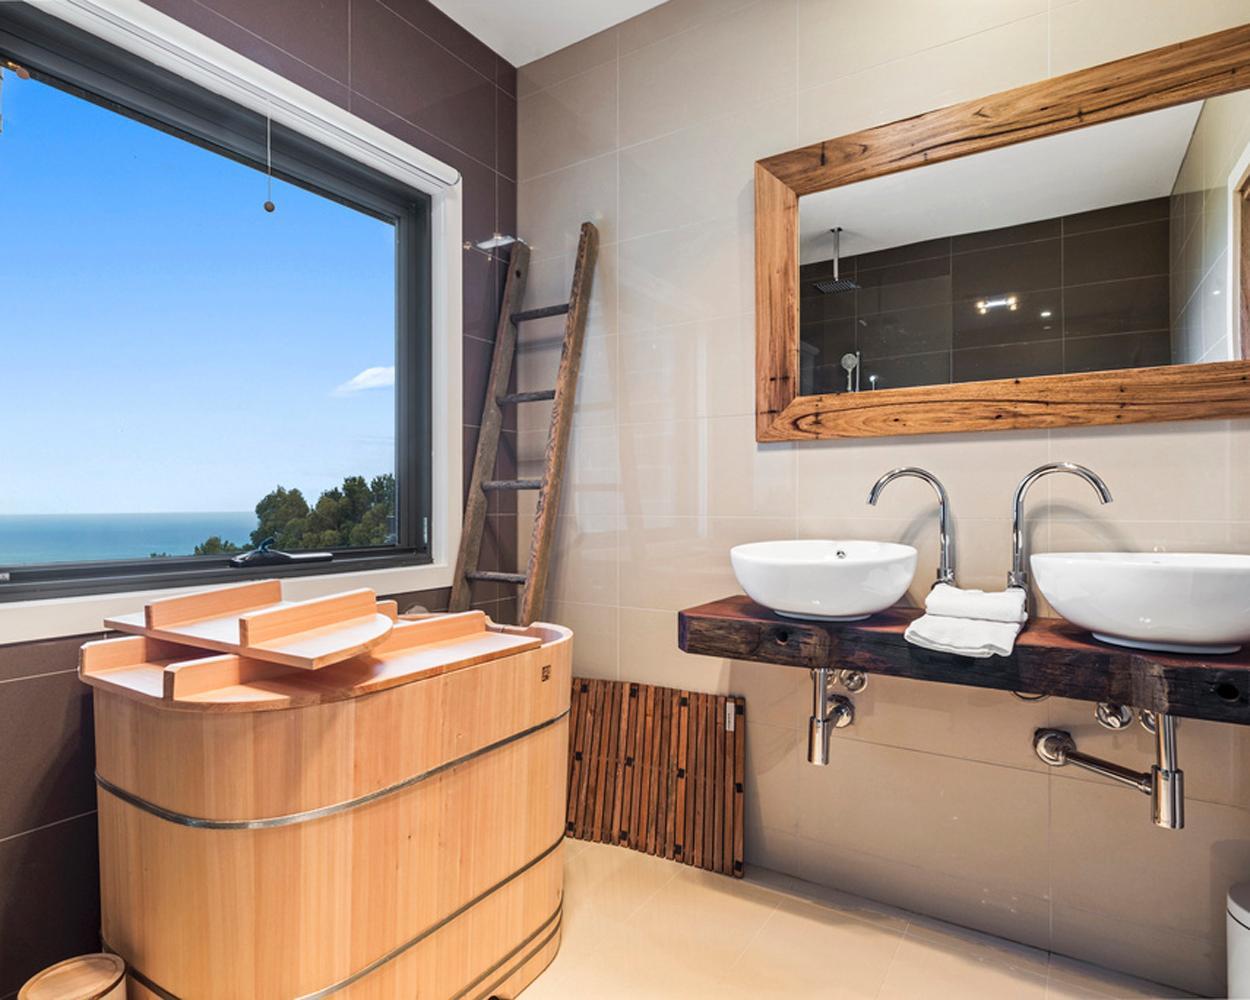 Bartok Design creates traditional Japanese soaking tubs